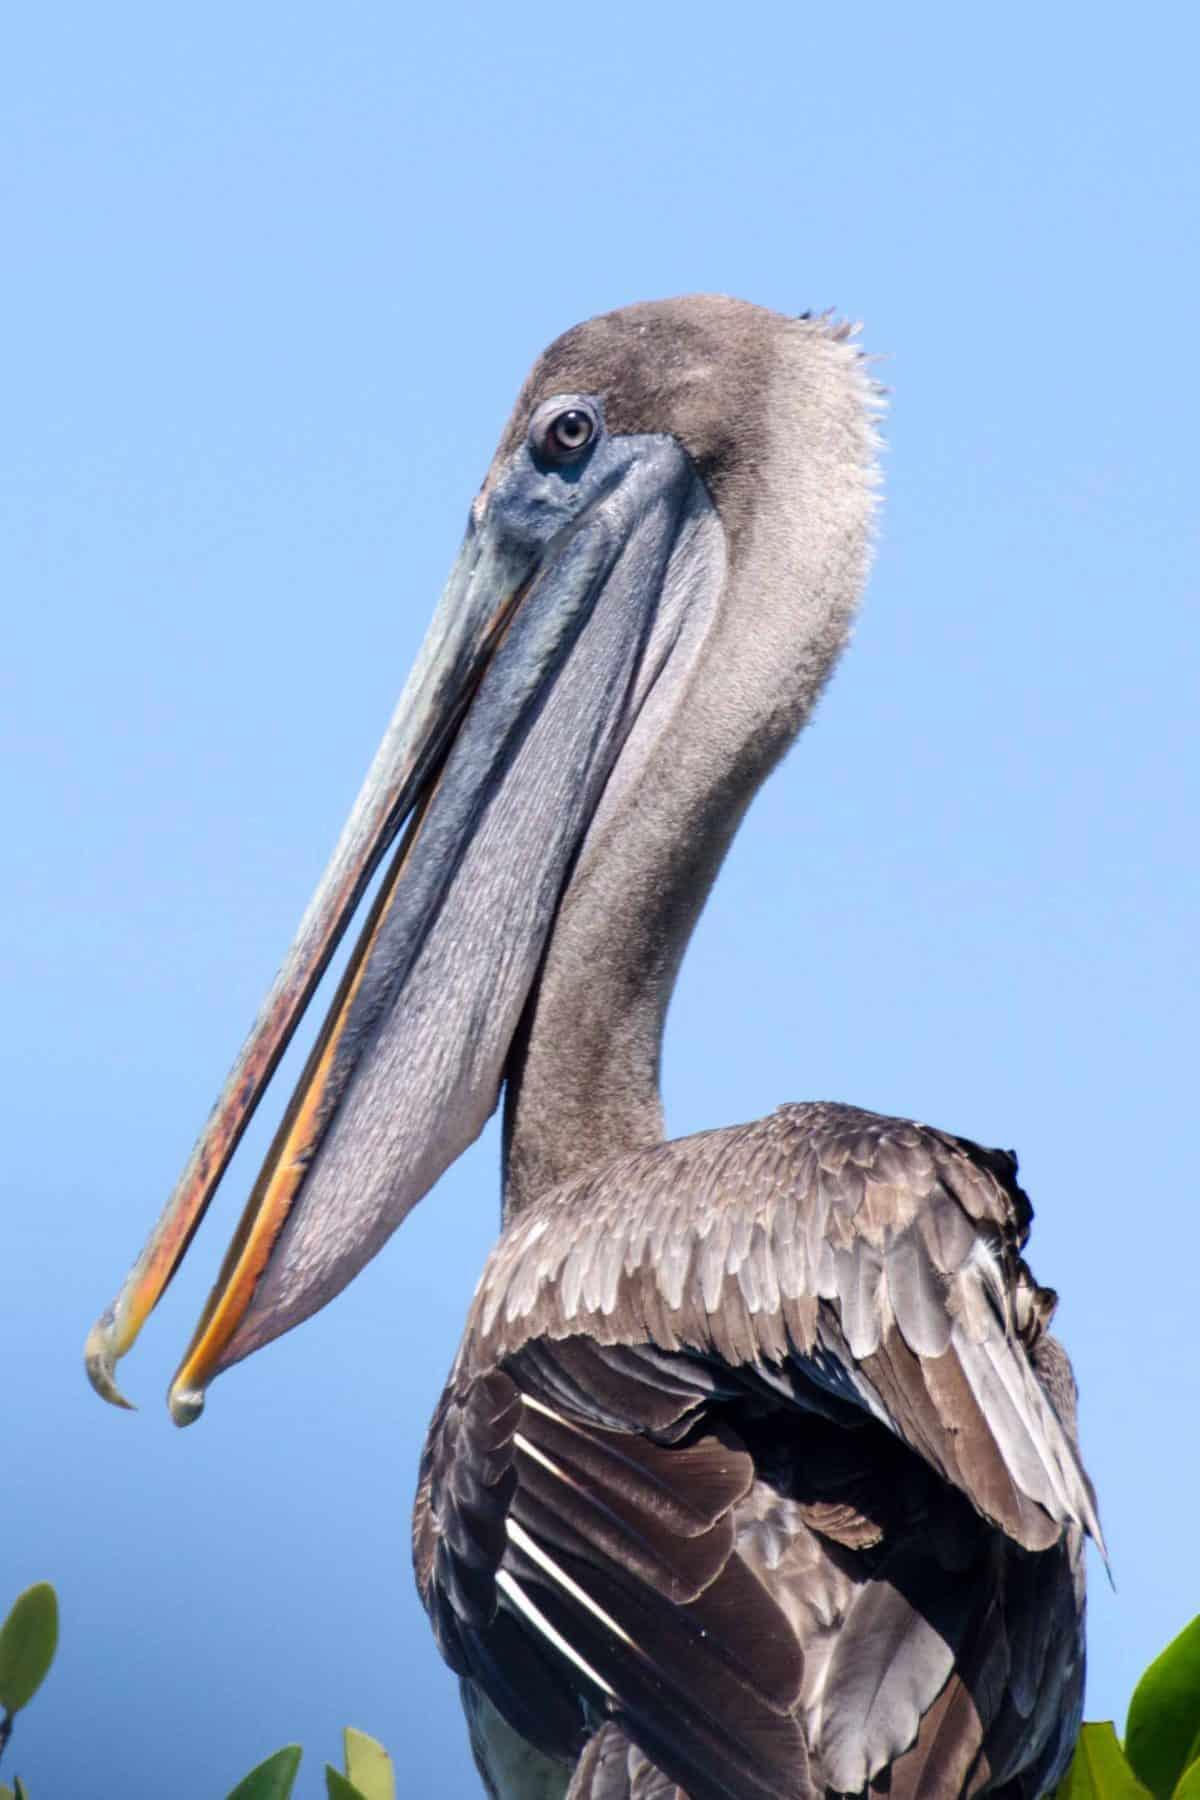 Brown Pelican, Isabela Island, The Galapagos, Ecuador | ©Angela Drake / Not Your Average American